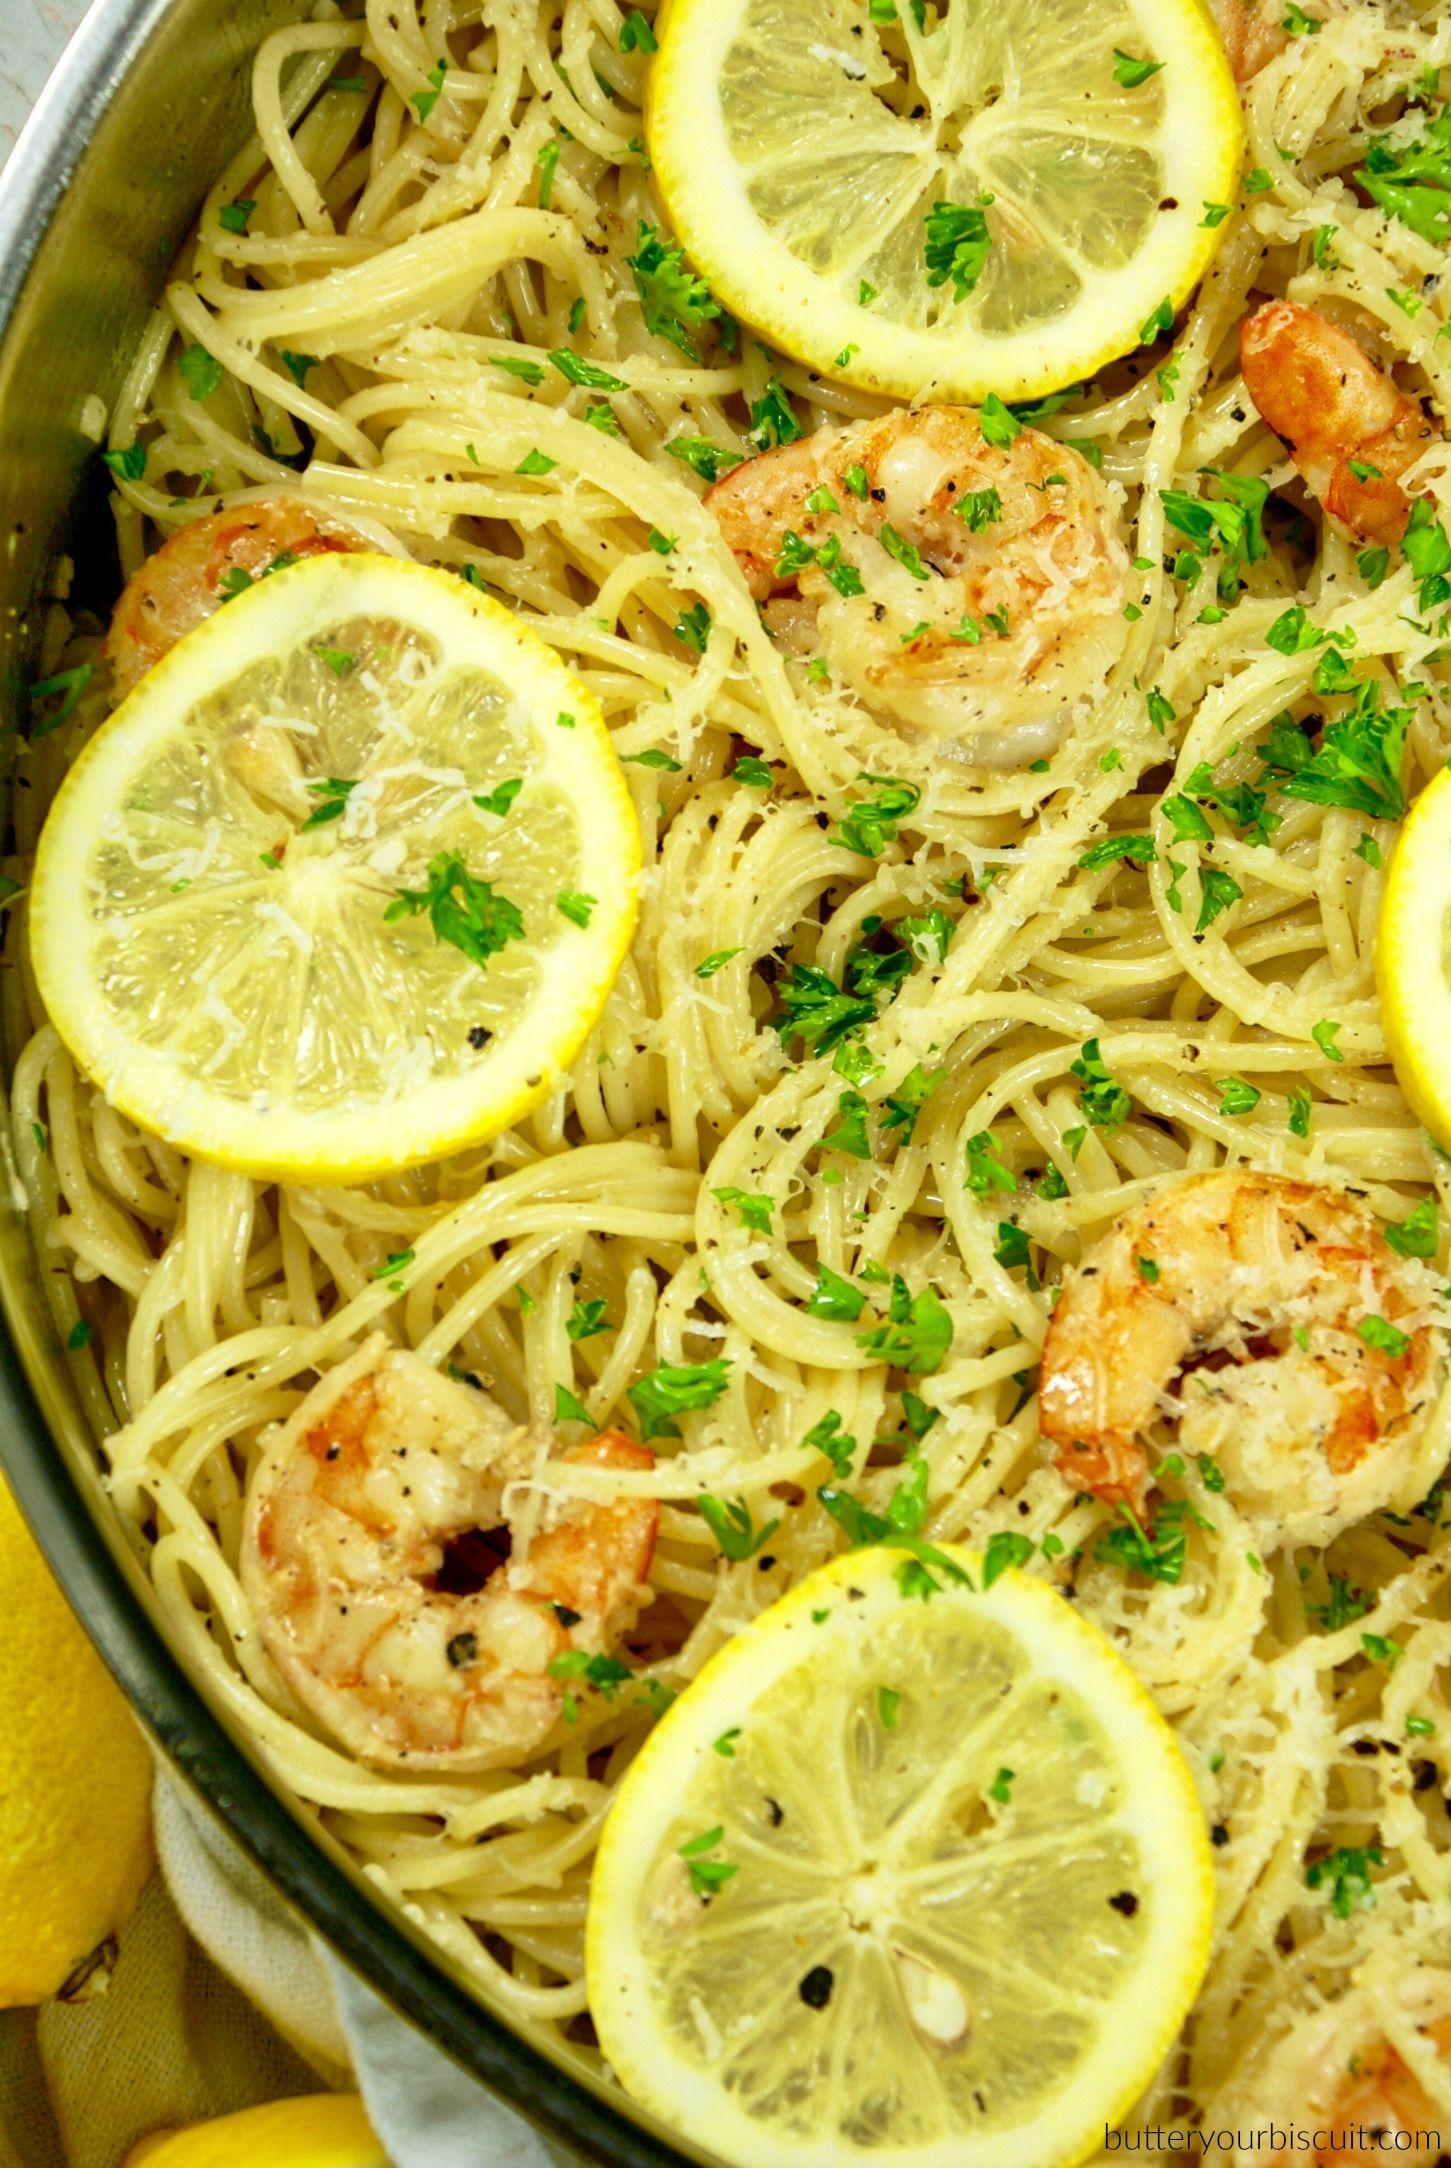 Easy Lemon Garlic Shrimp Pasta-Butter Your Biscuit